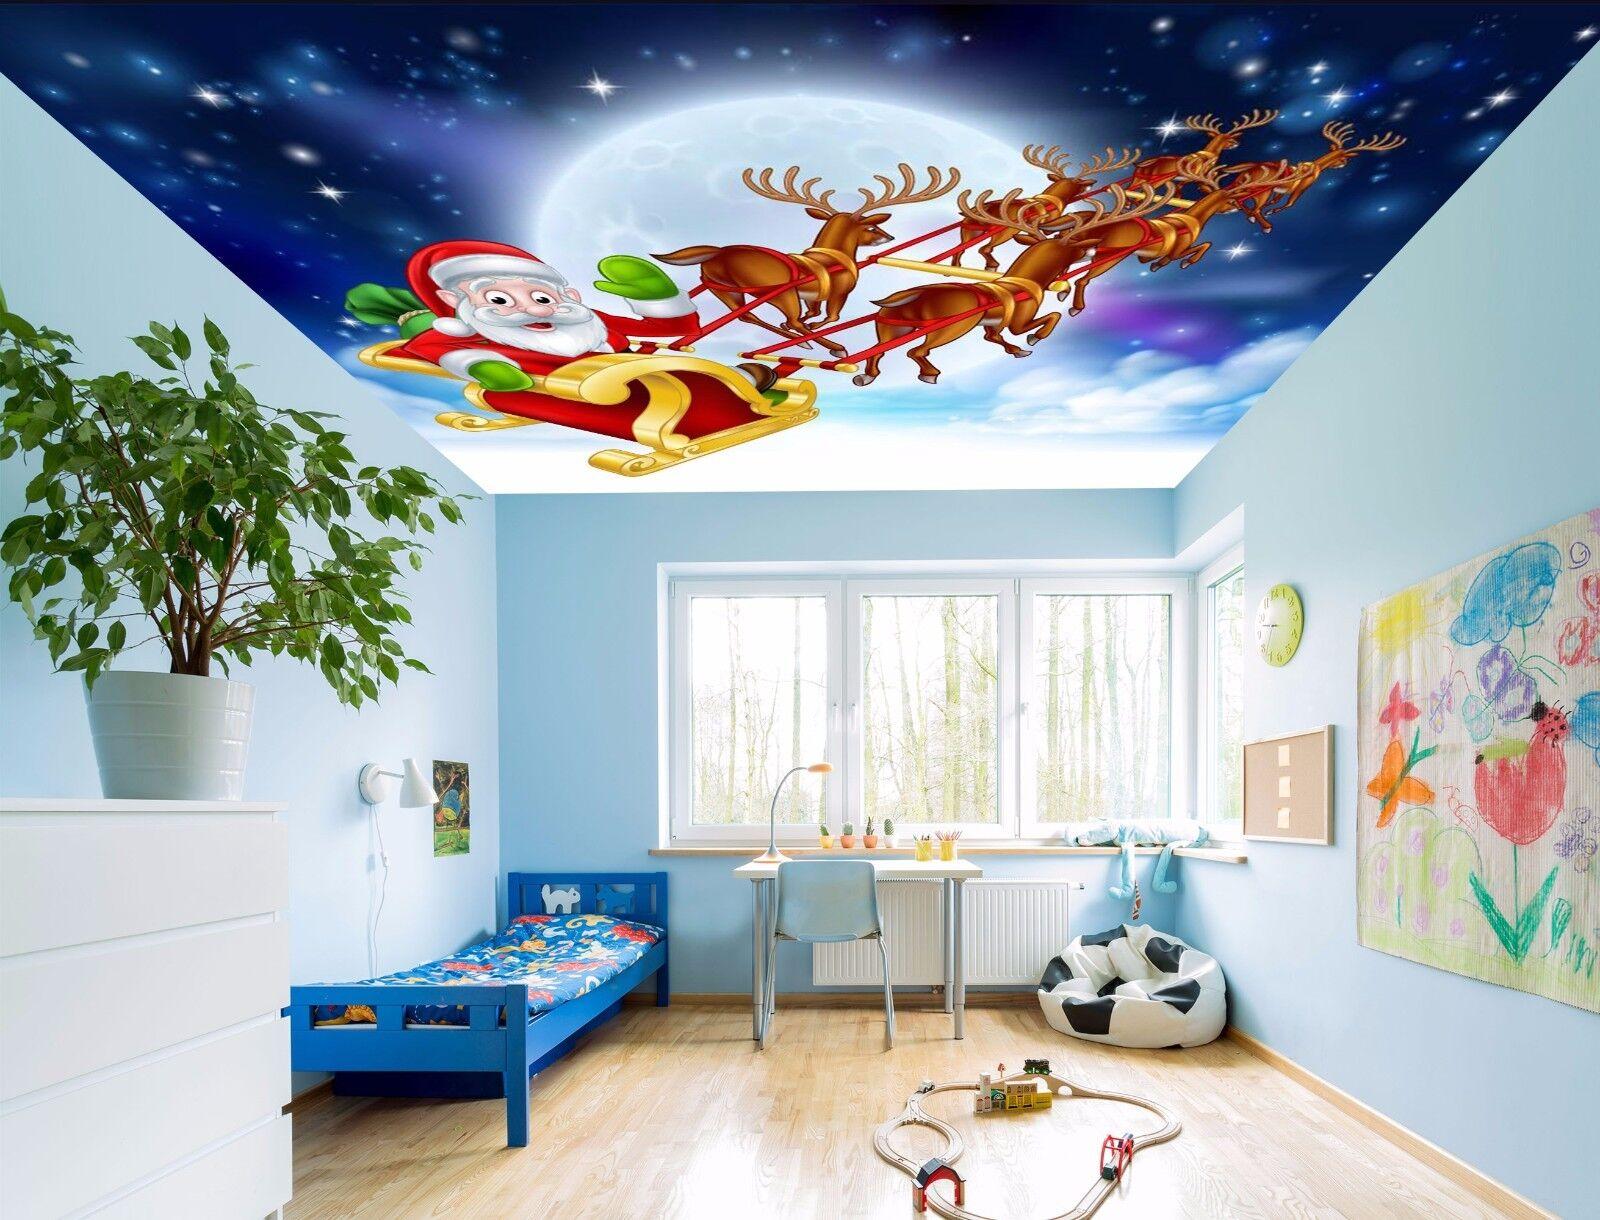 3D Santa Claus 754 Ceiling WallPaper Murals Wall Print Decal Deco AJ WALLPAPER